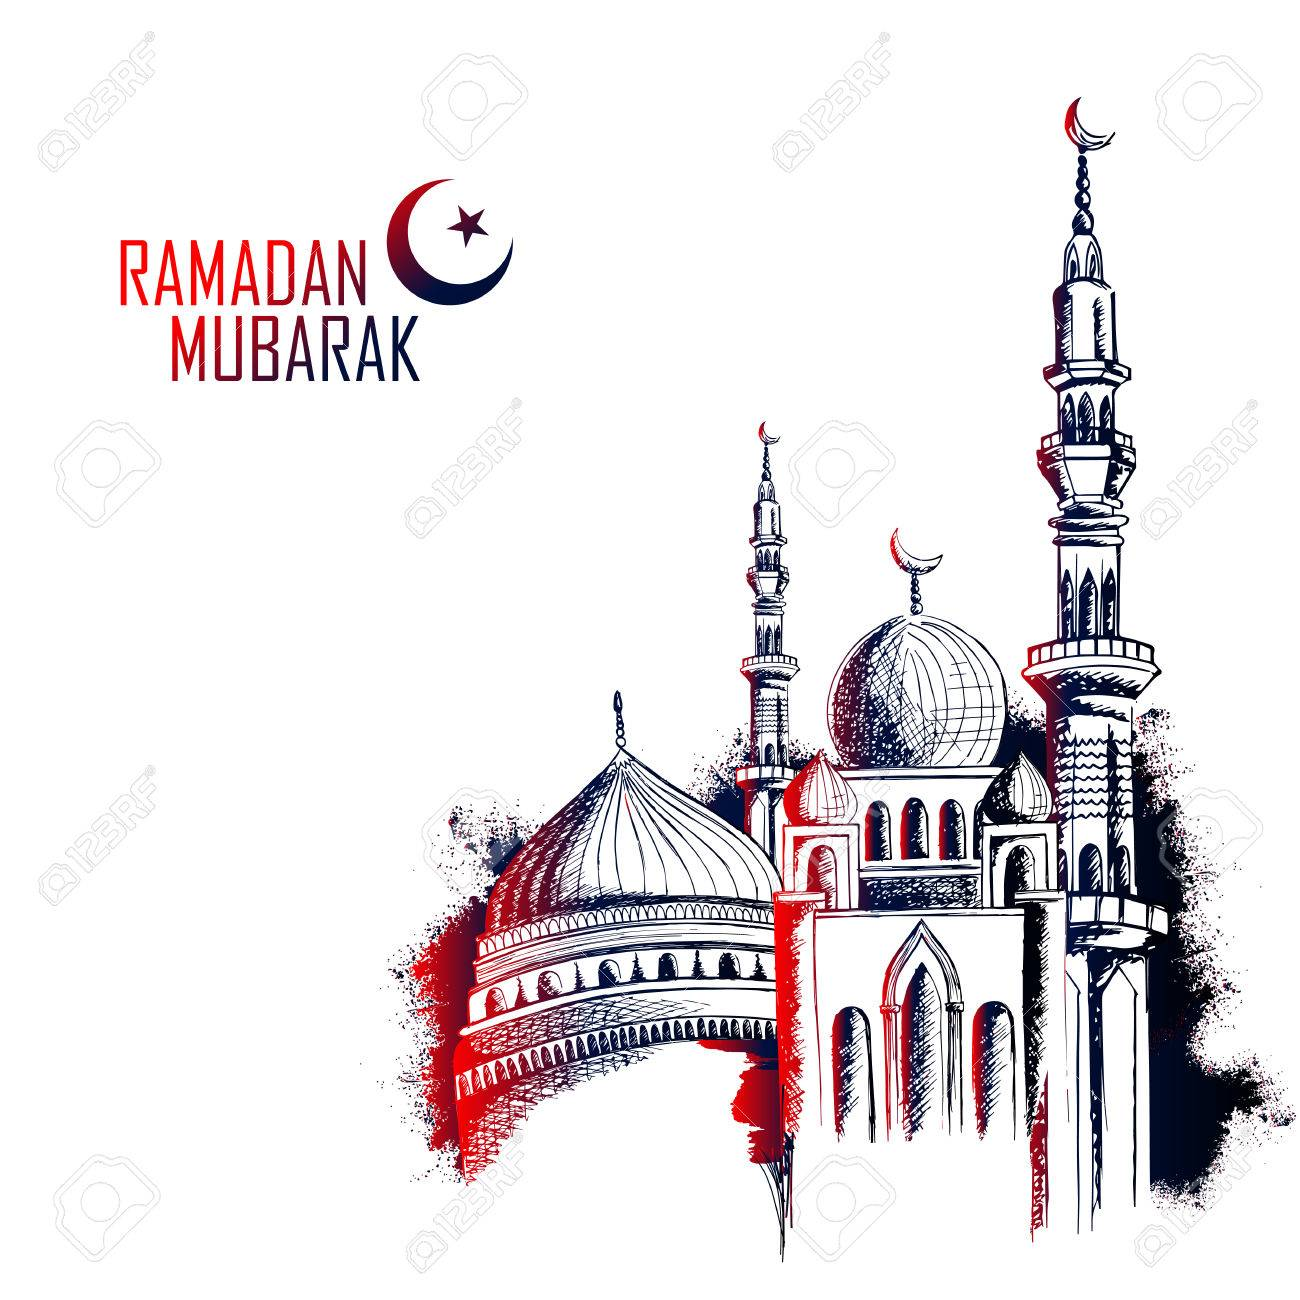 Ramadan Kareem Generous Ramadan greetings in Arabic freehand with mosque - 79575064